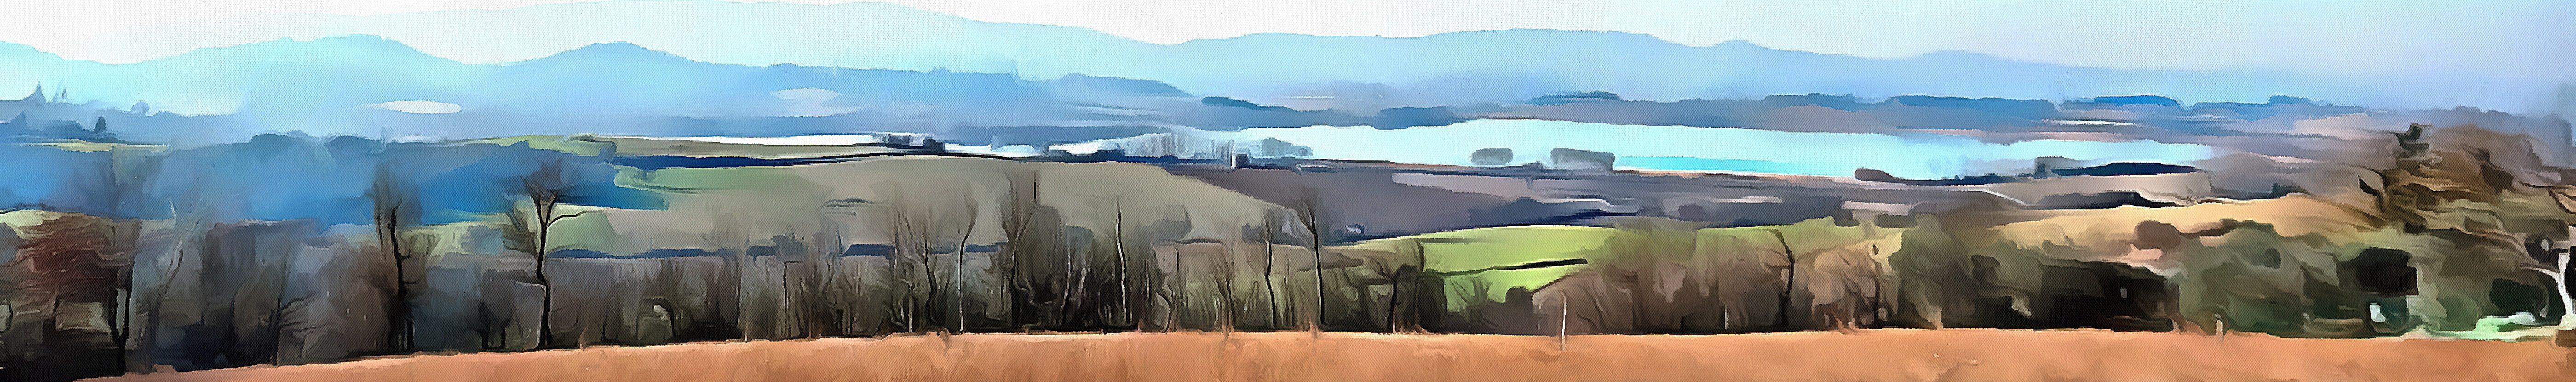 Dorothy Berry-Lound Art